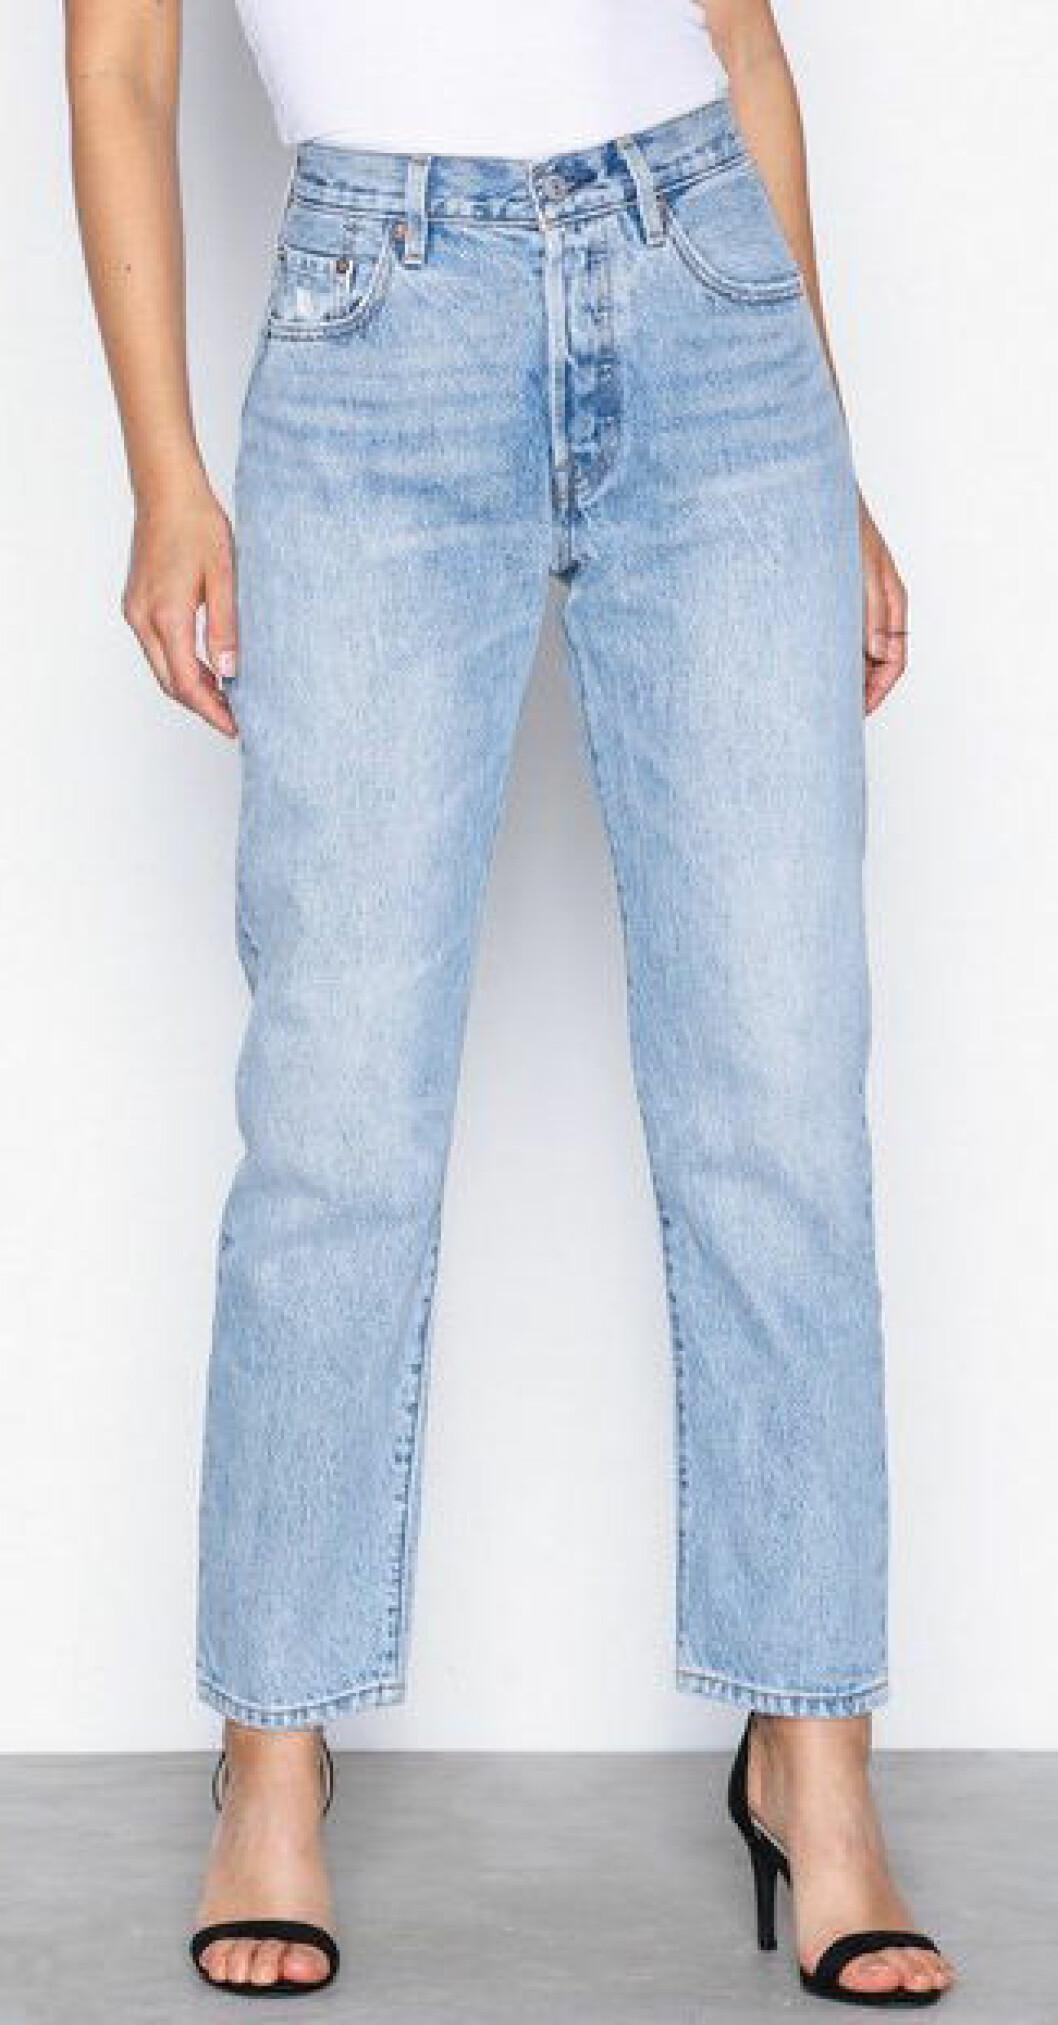 jeans-hosten-2018-Levis